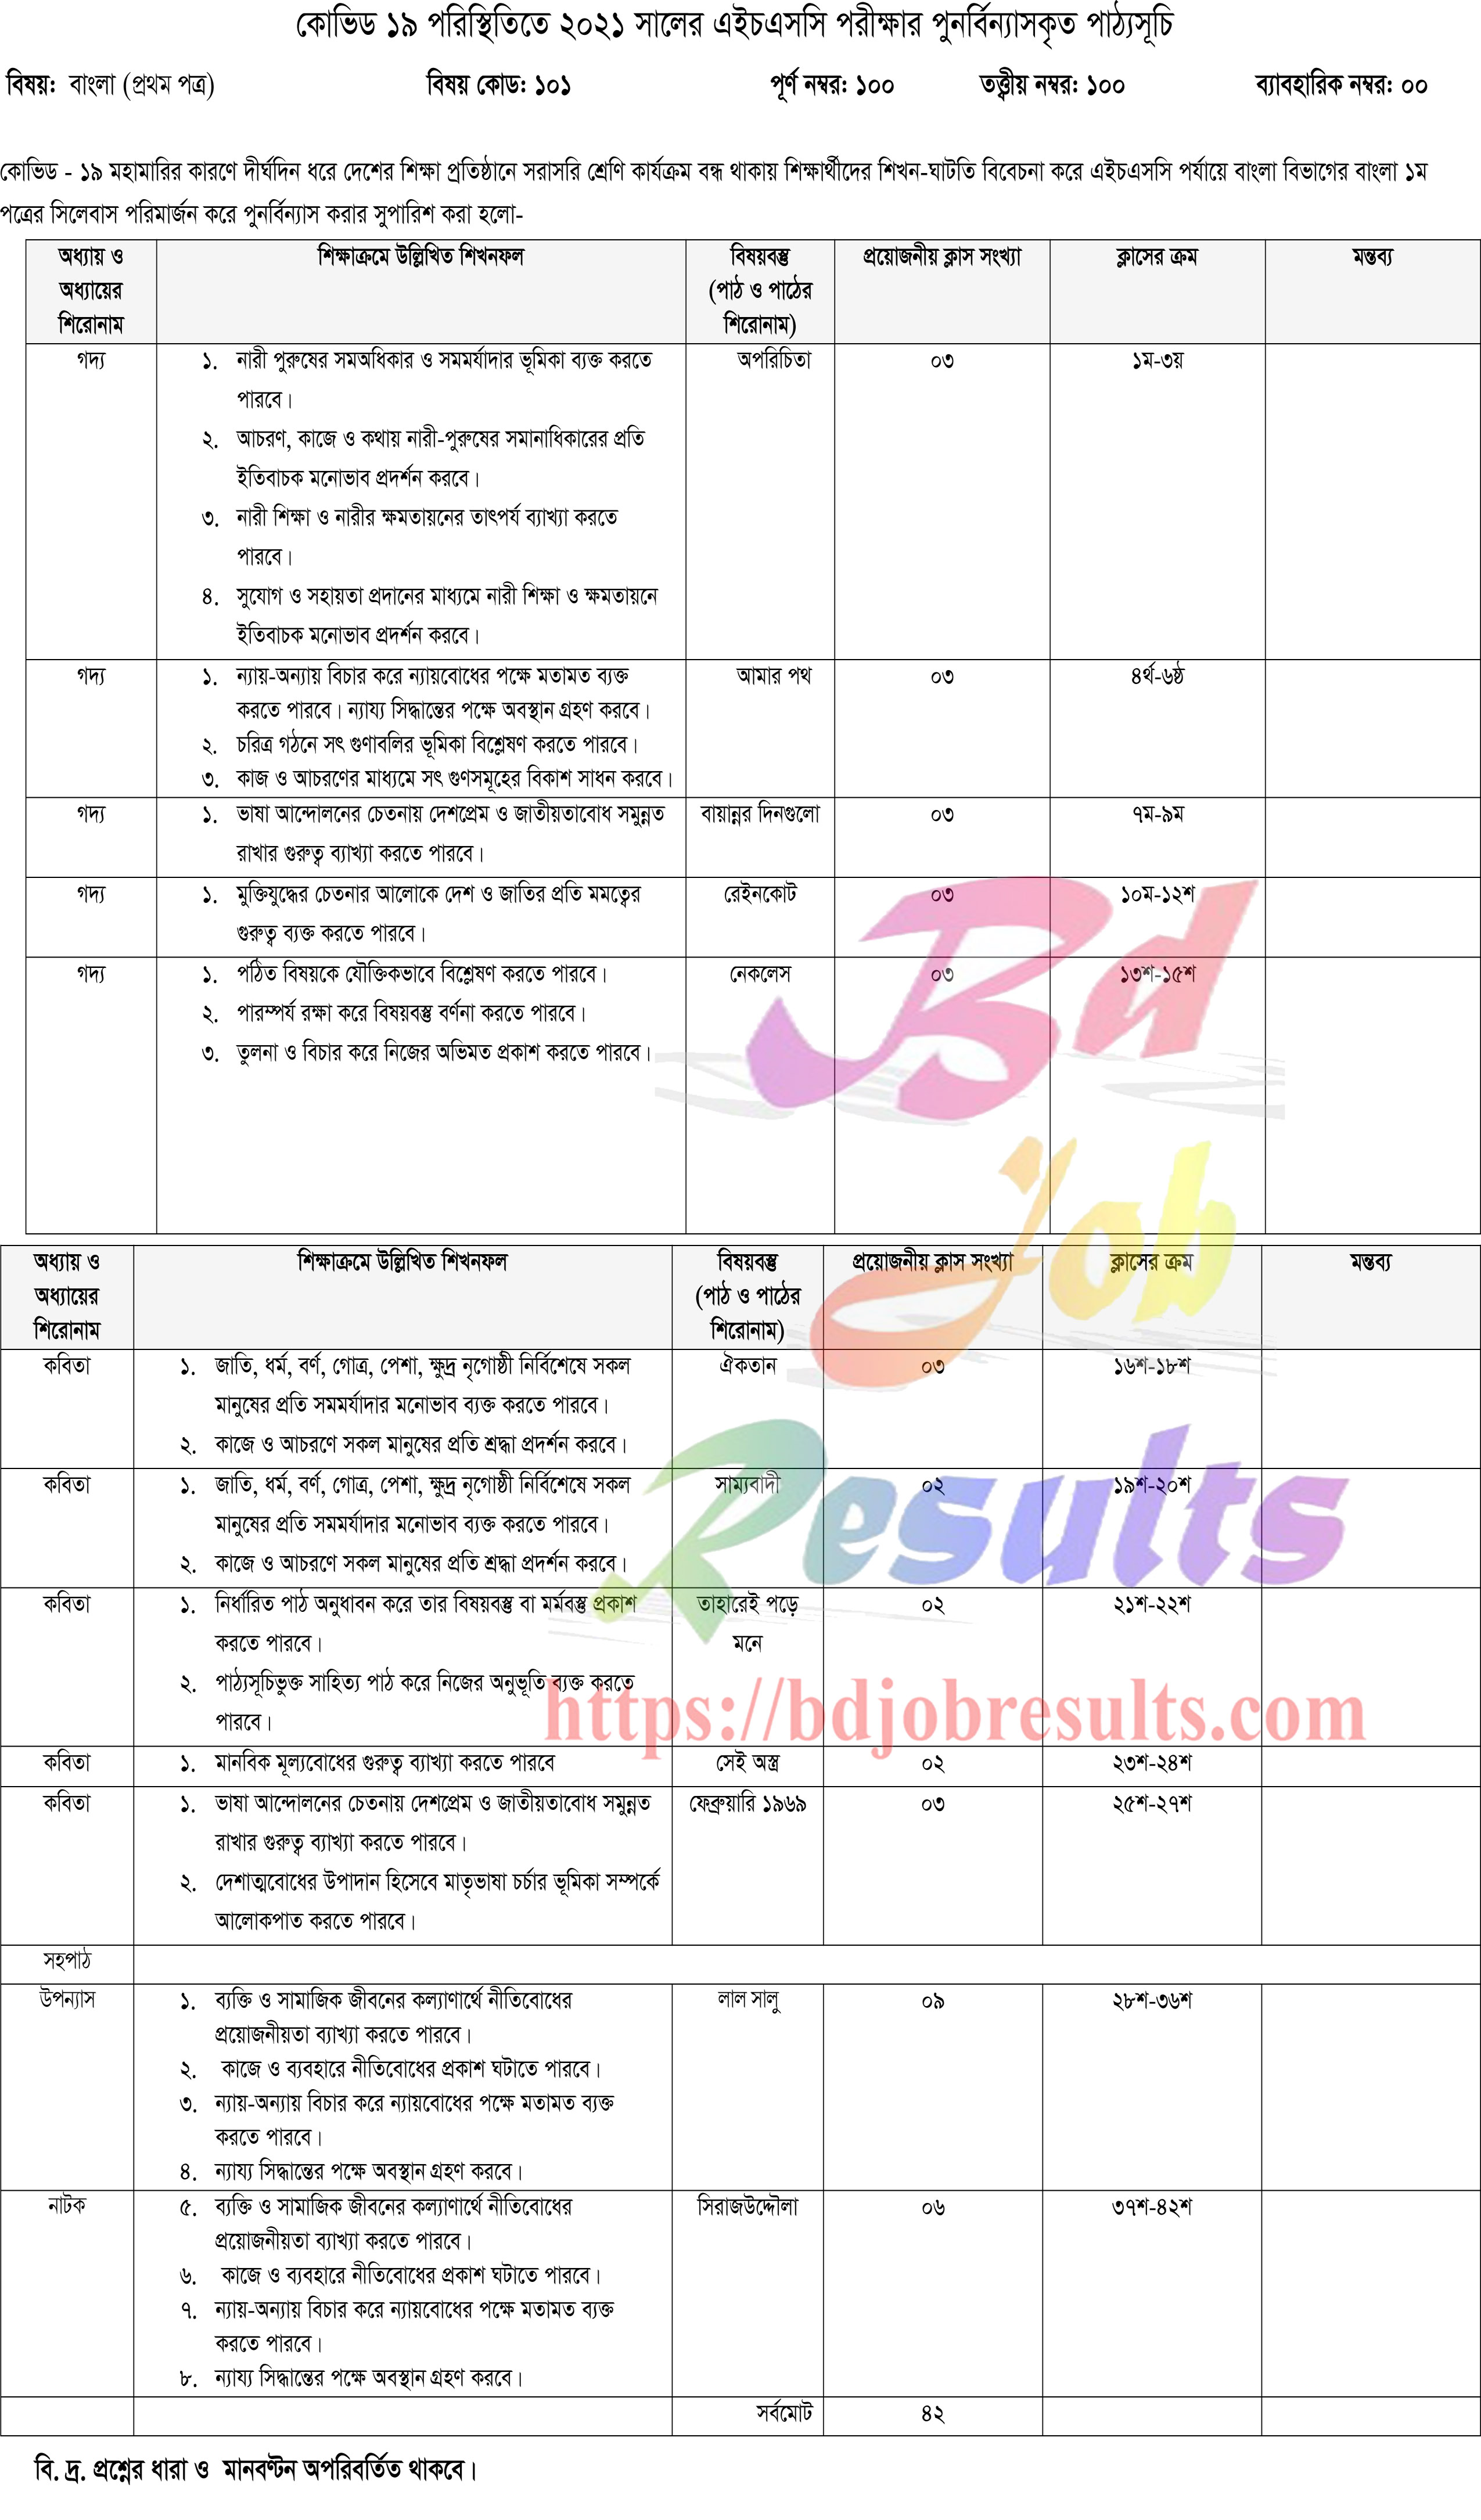 HSC-Bangla-1st-Paper-Short-Syllabus-2021